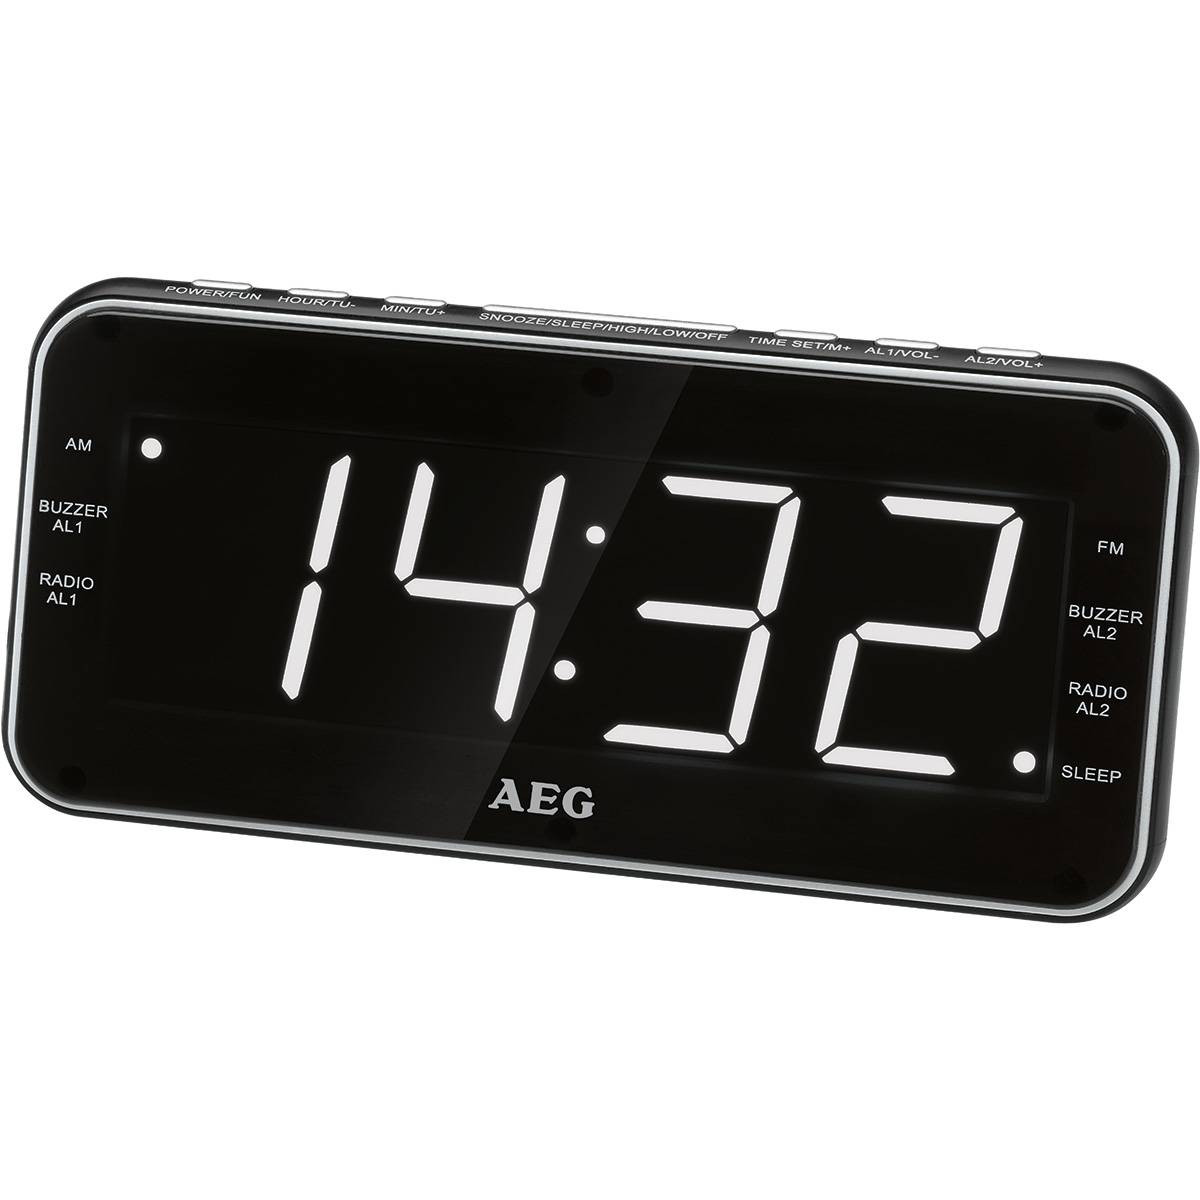 AEG MRC 4157 - Radio despertador digital con USB